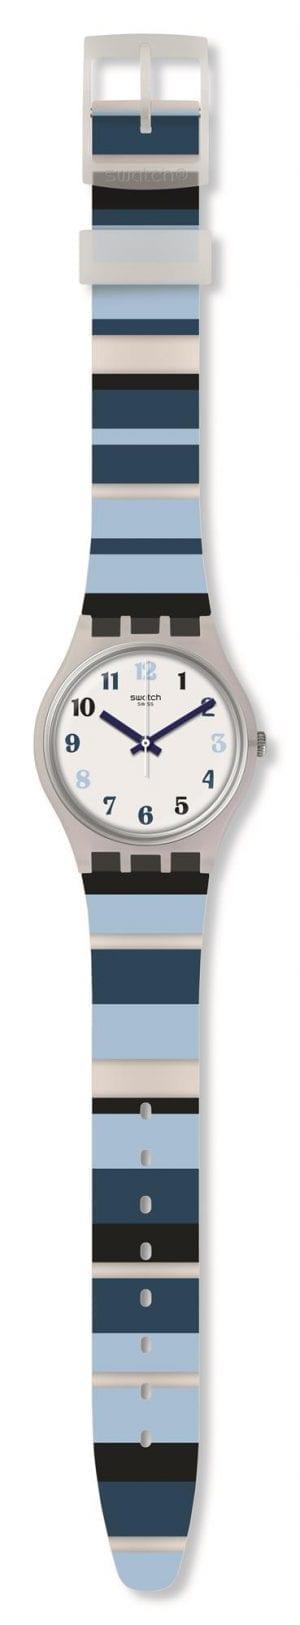 Swatch Night Sky White Dial Blue Stripey Strap Mens Boys Watch GE275 34mm